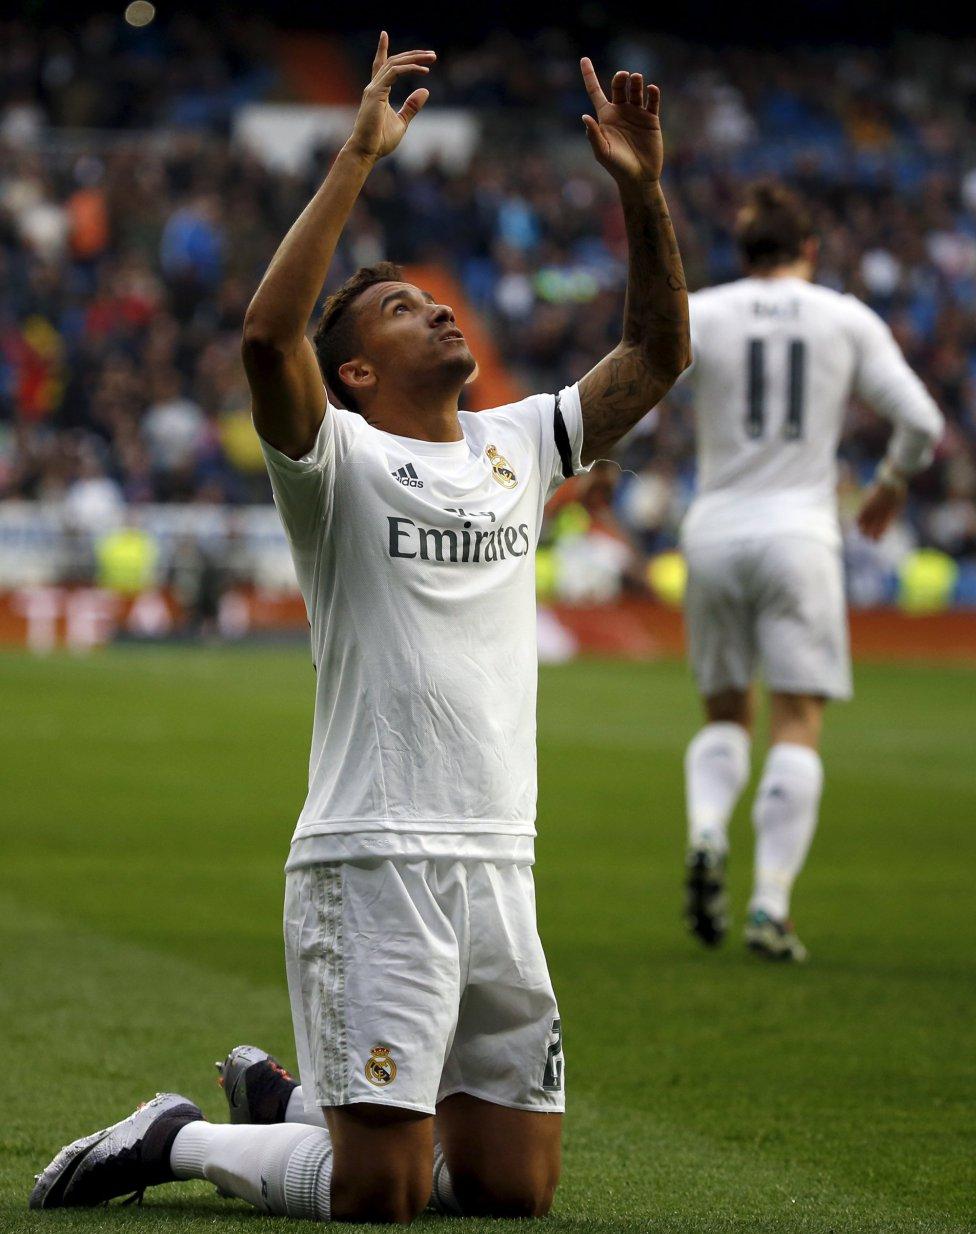 Реал Мадрид - Райо Валекано